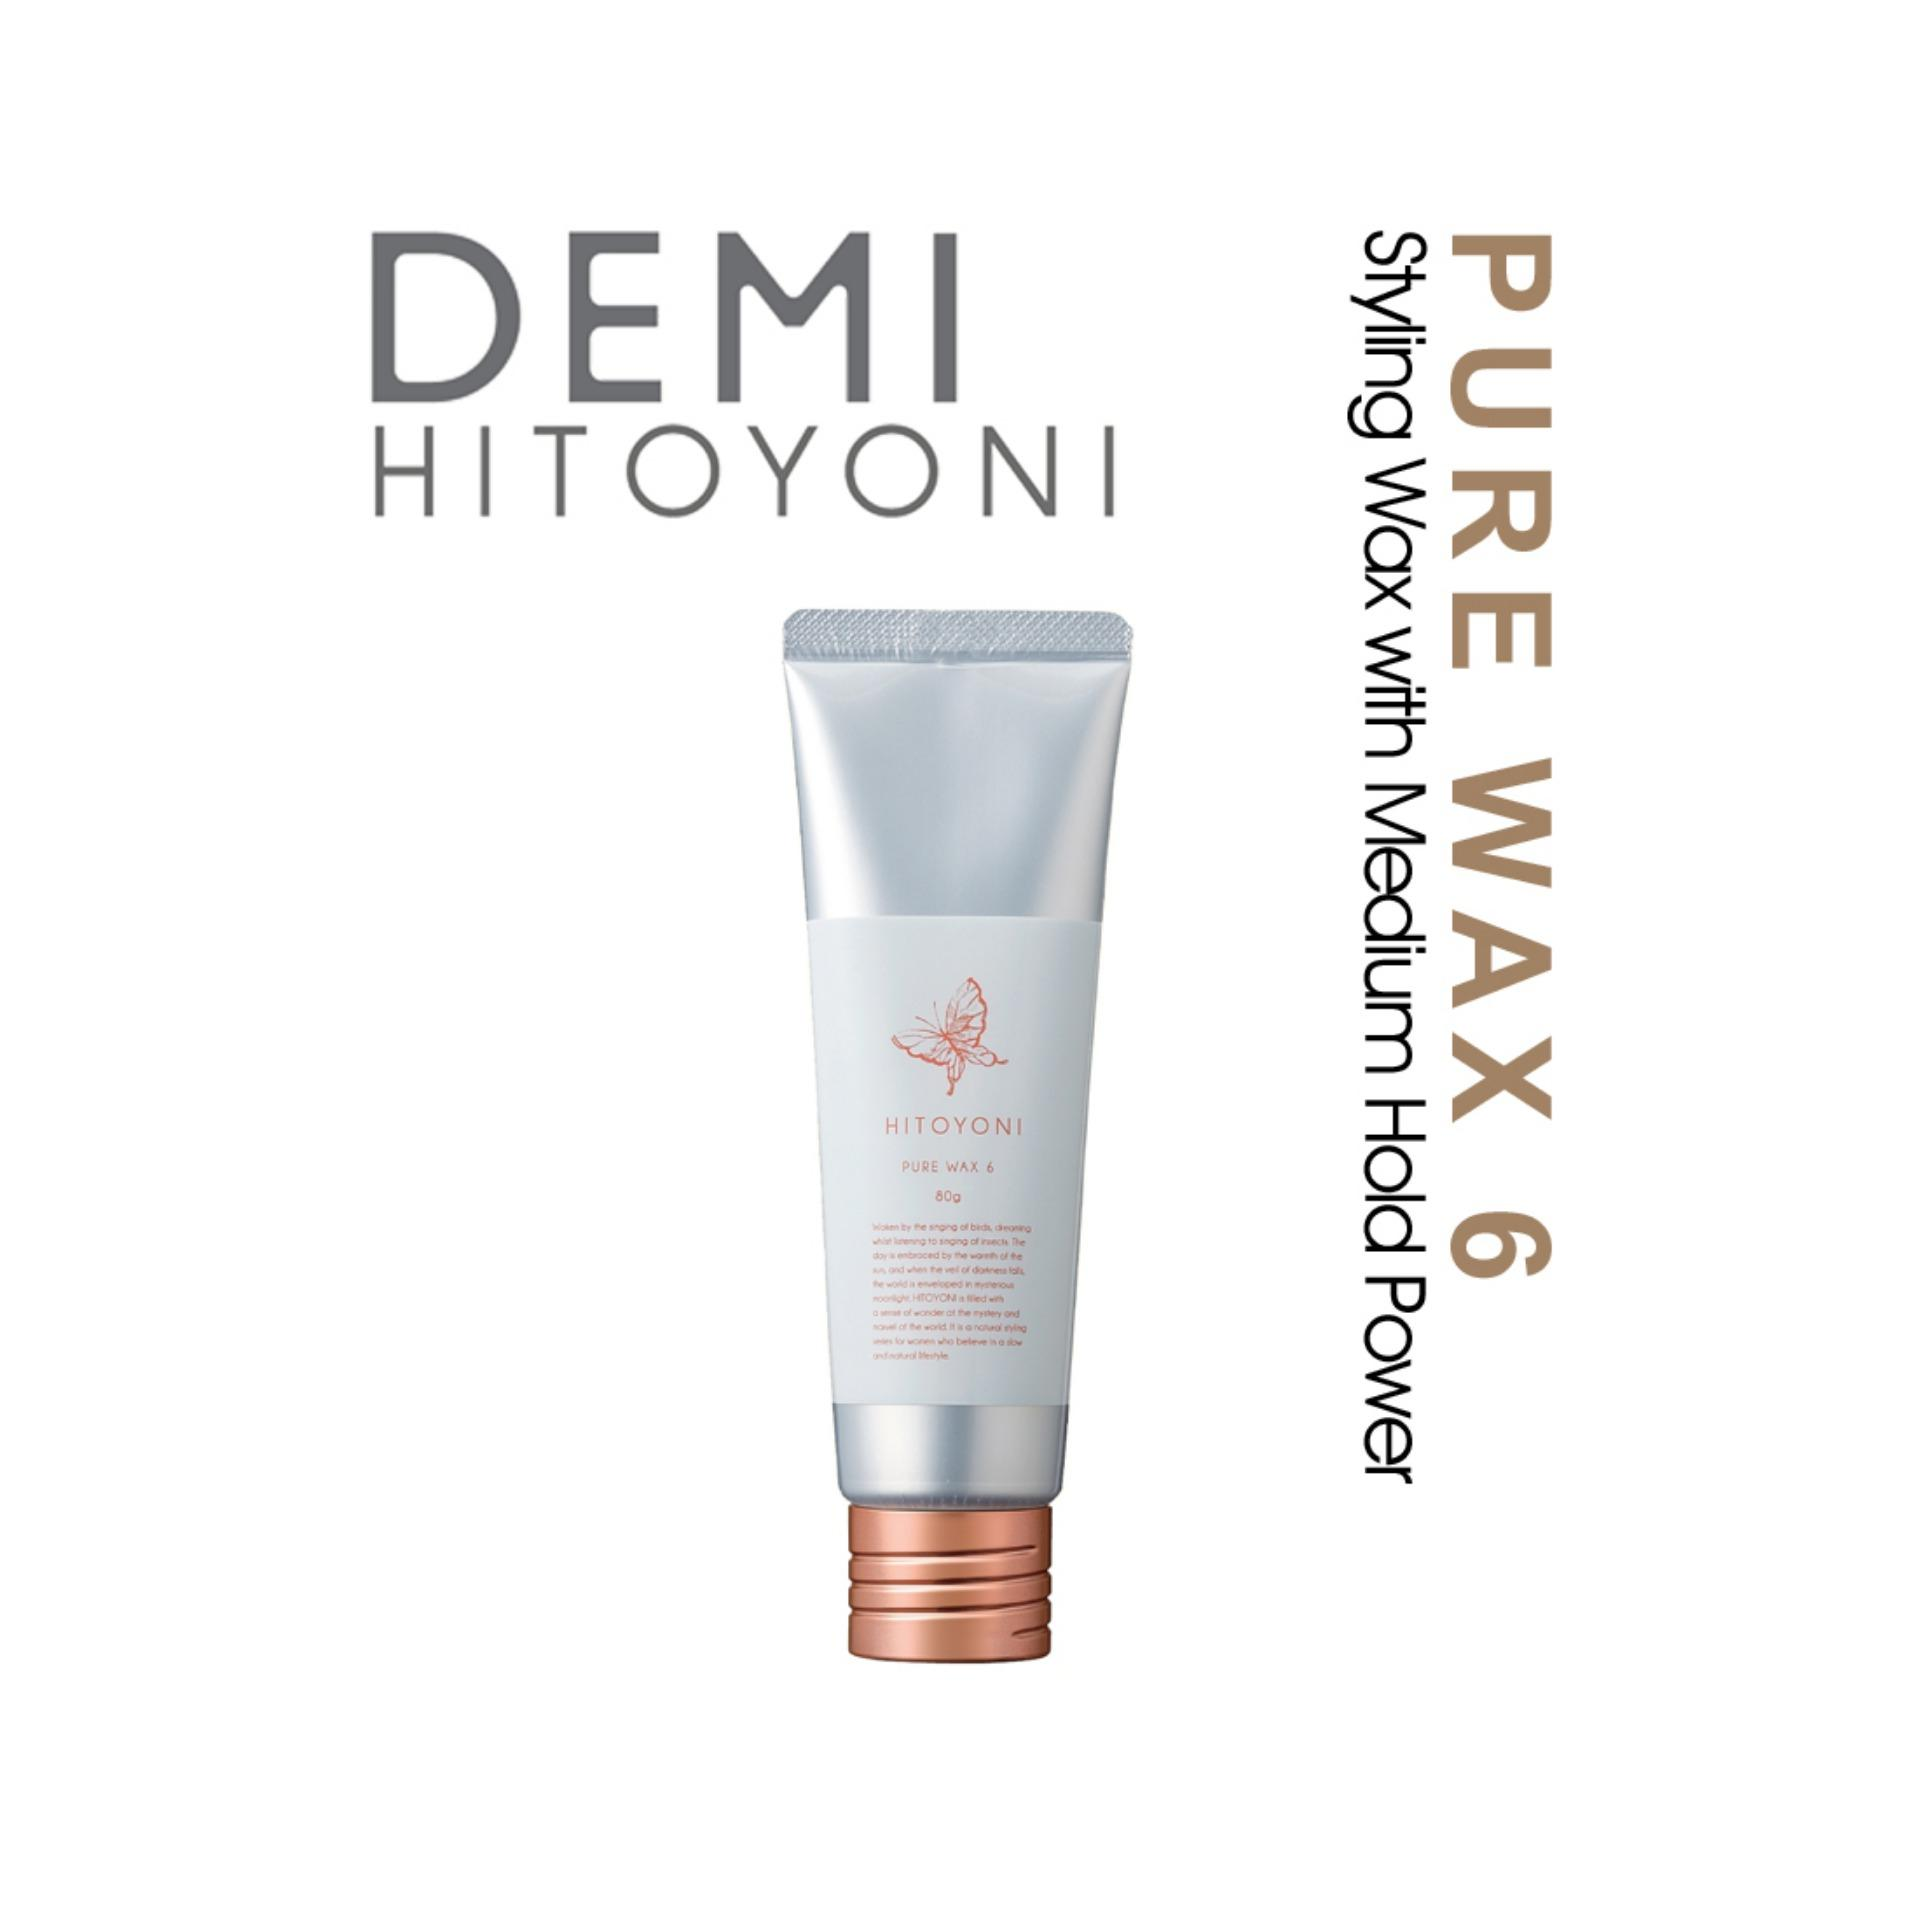 Buy Demi Hitoyoni Pure Wax 6 80g Singapore